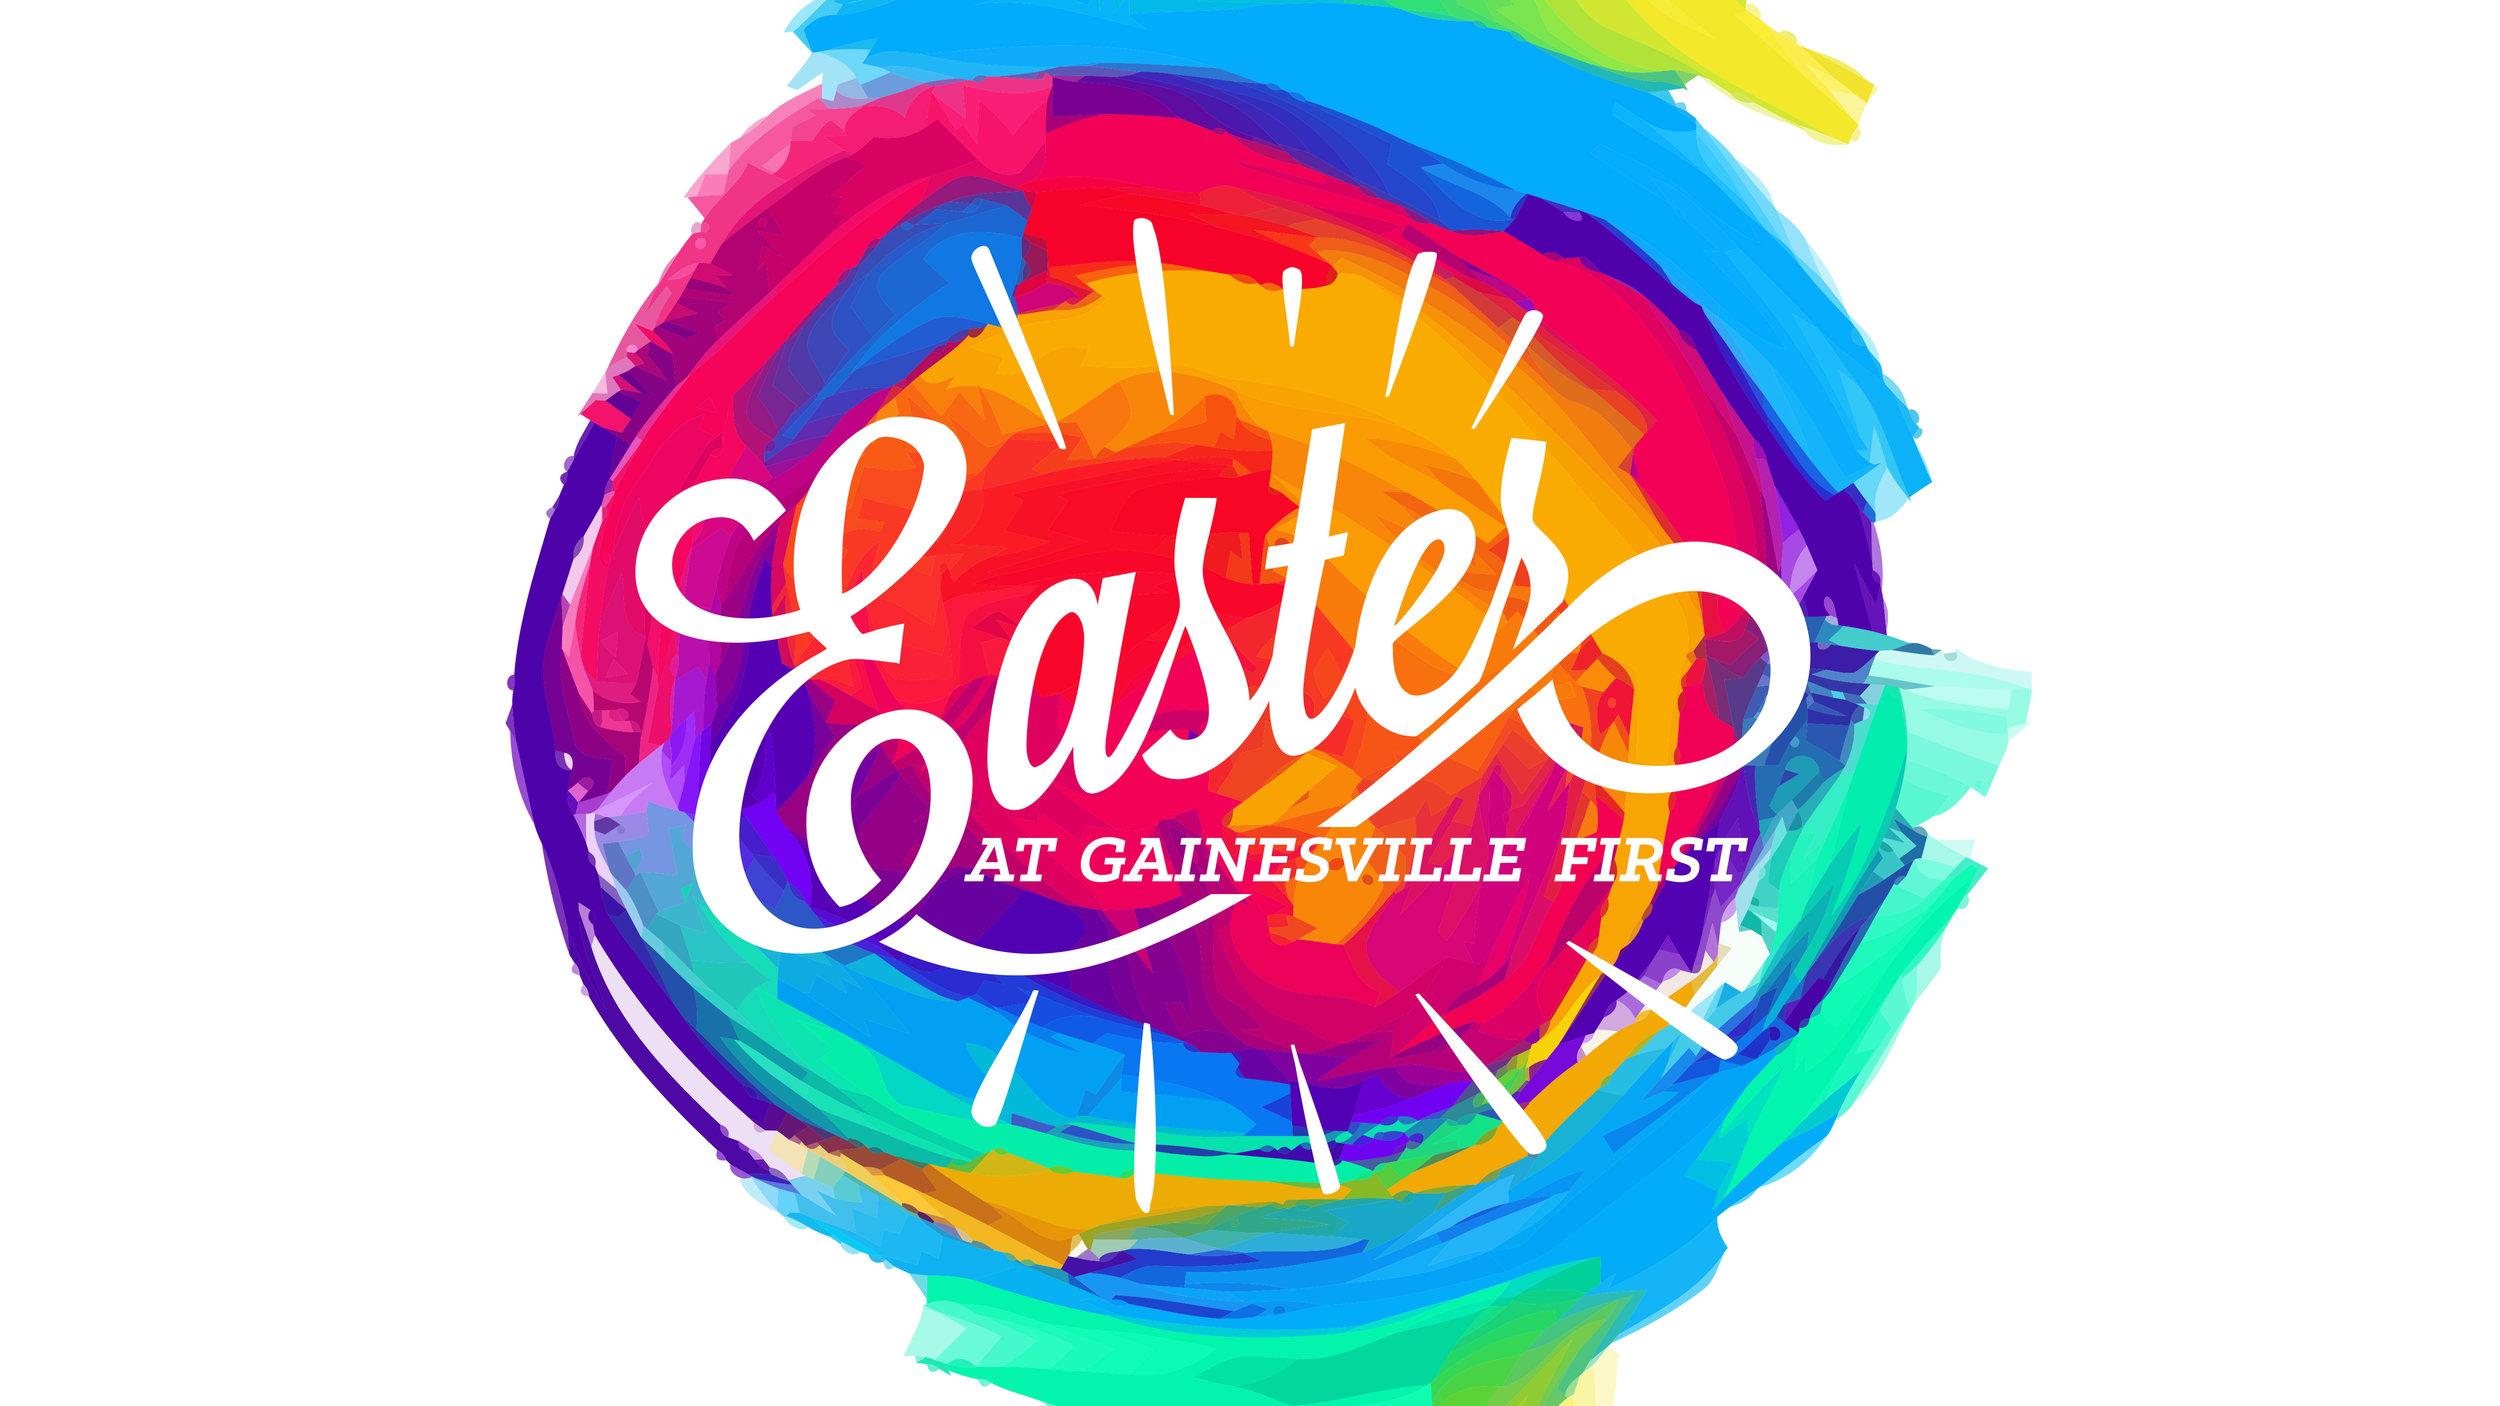 art_easter_at_gainesville_first_2018.jpg